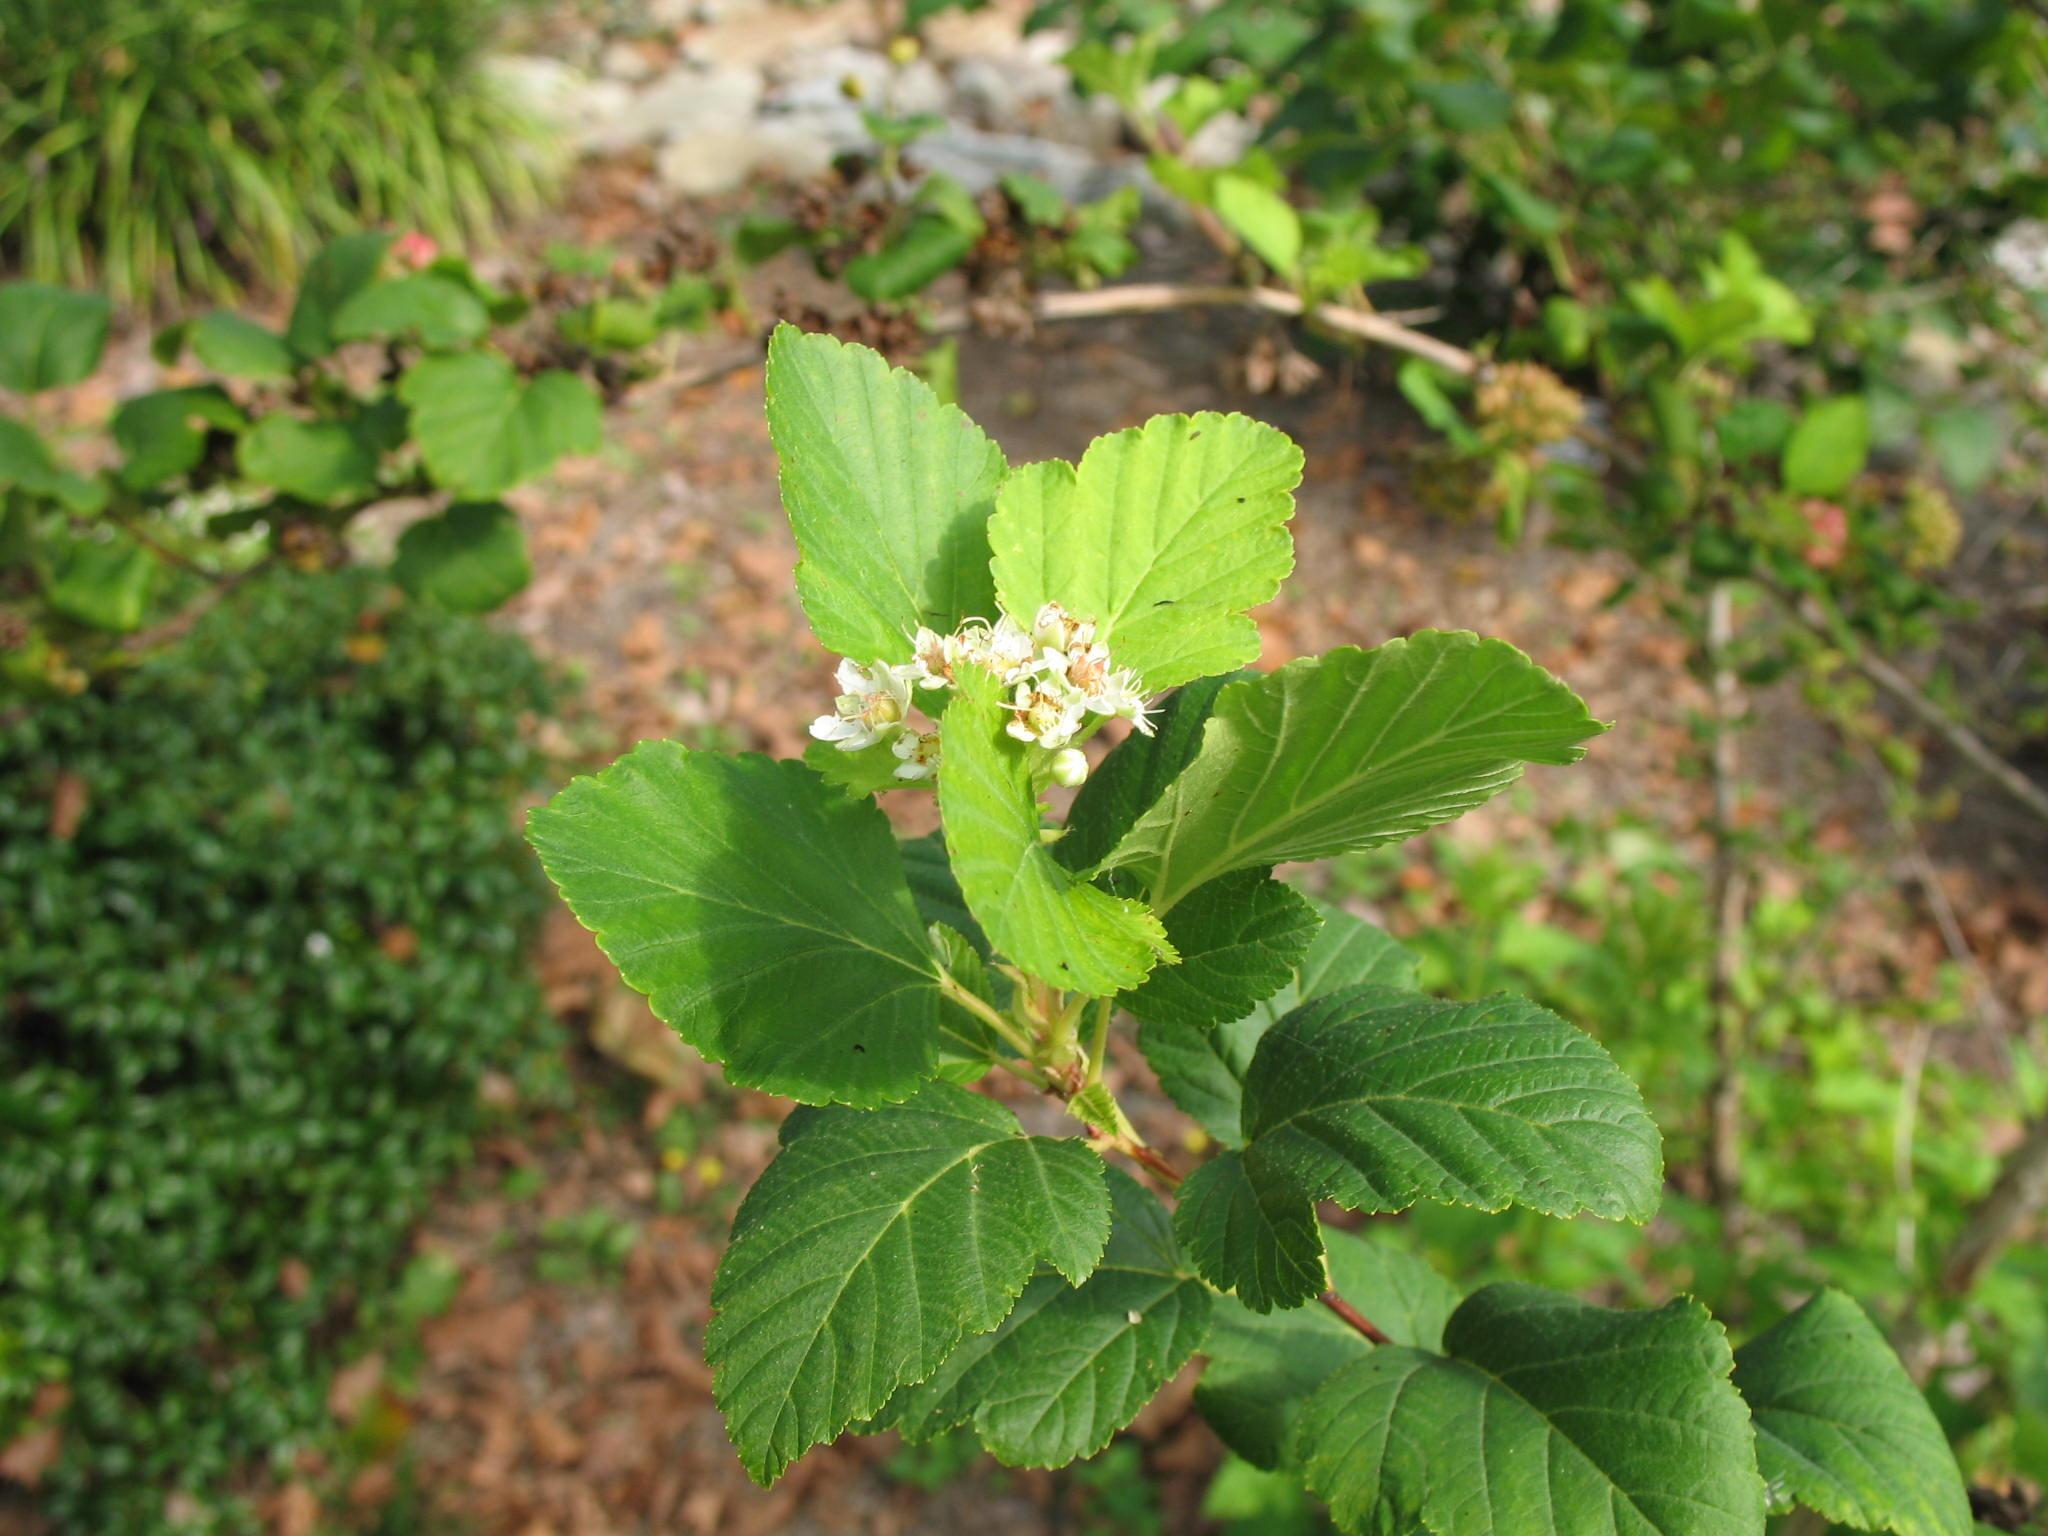 Physocarpus opulifolius  / Physocarpus opulifolius